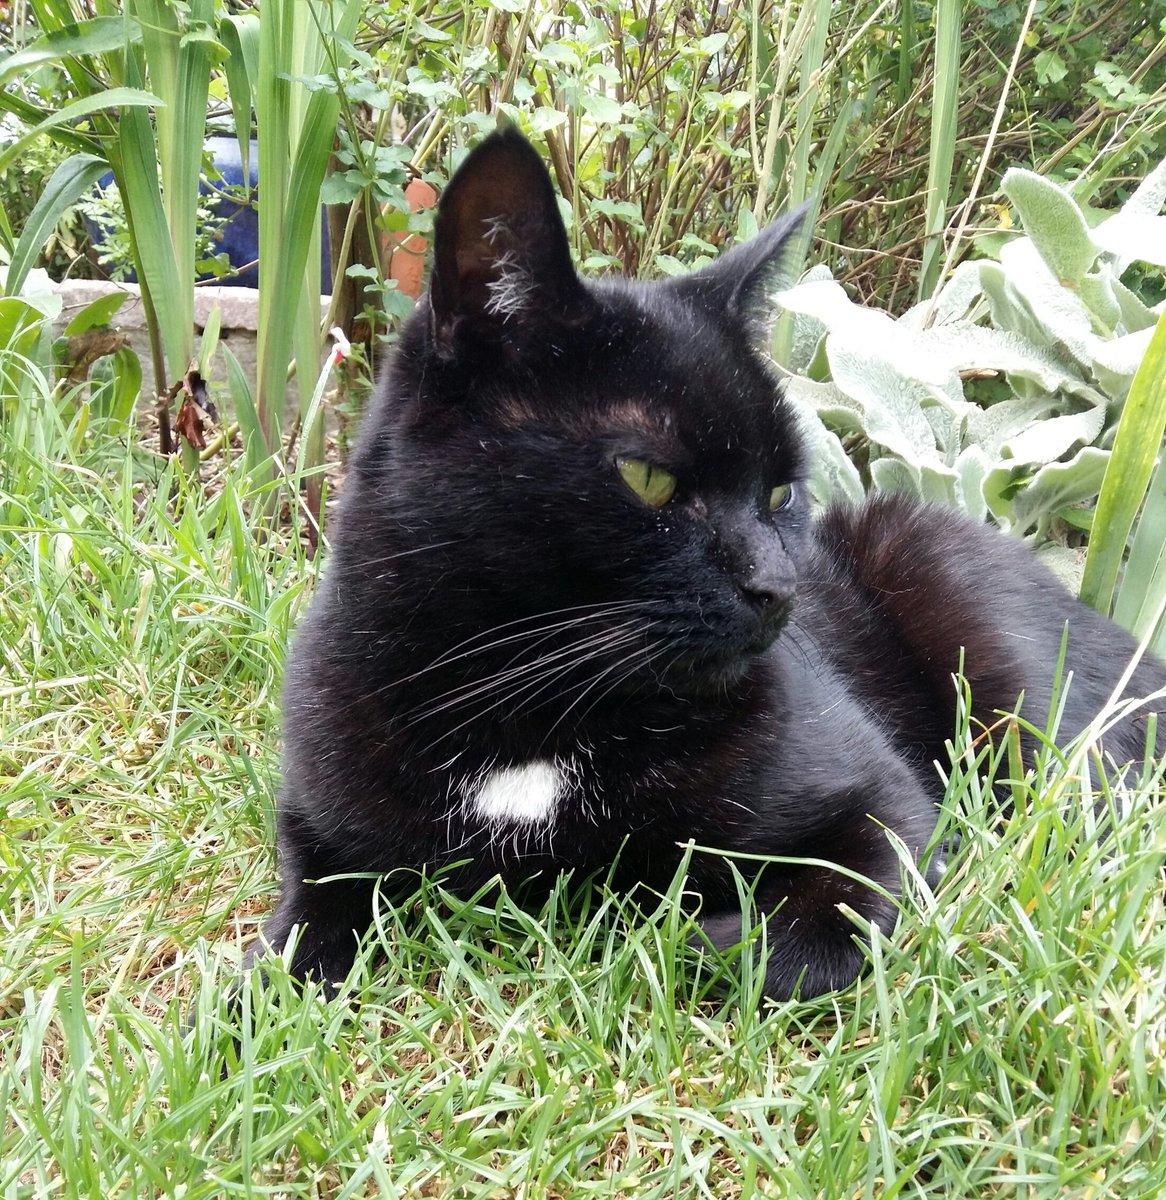 Happy #nationalblackcat from Benny! #blackcatday2020 #BlackCatDay #PanfurSquad https://t.co/1TqiPrKZZz